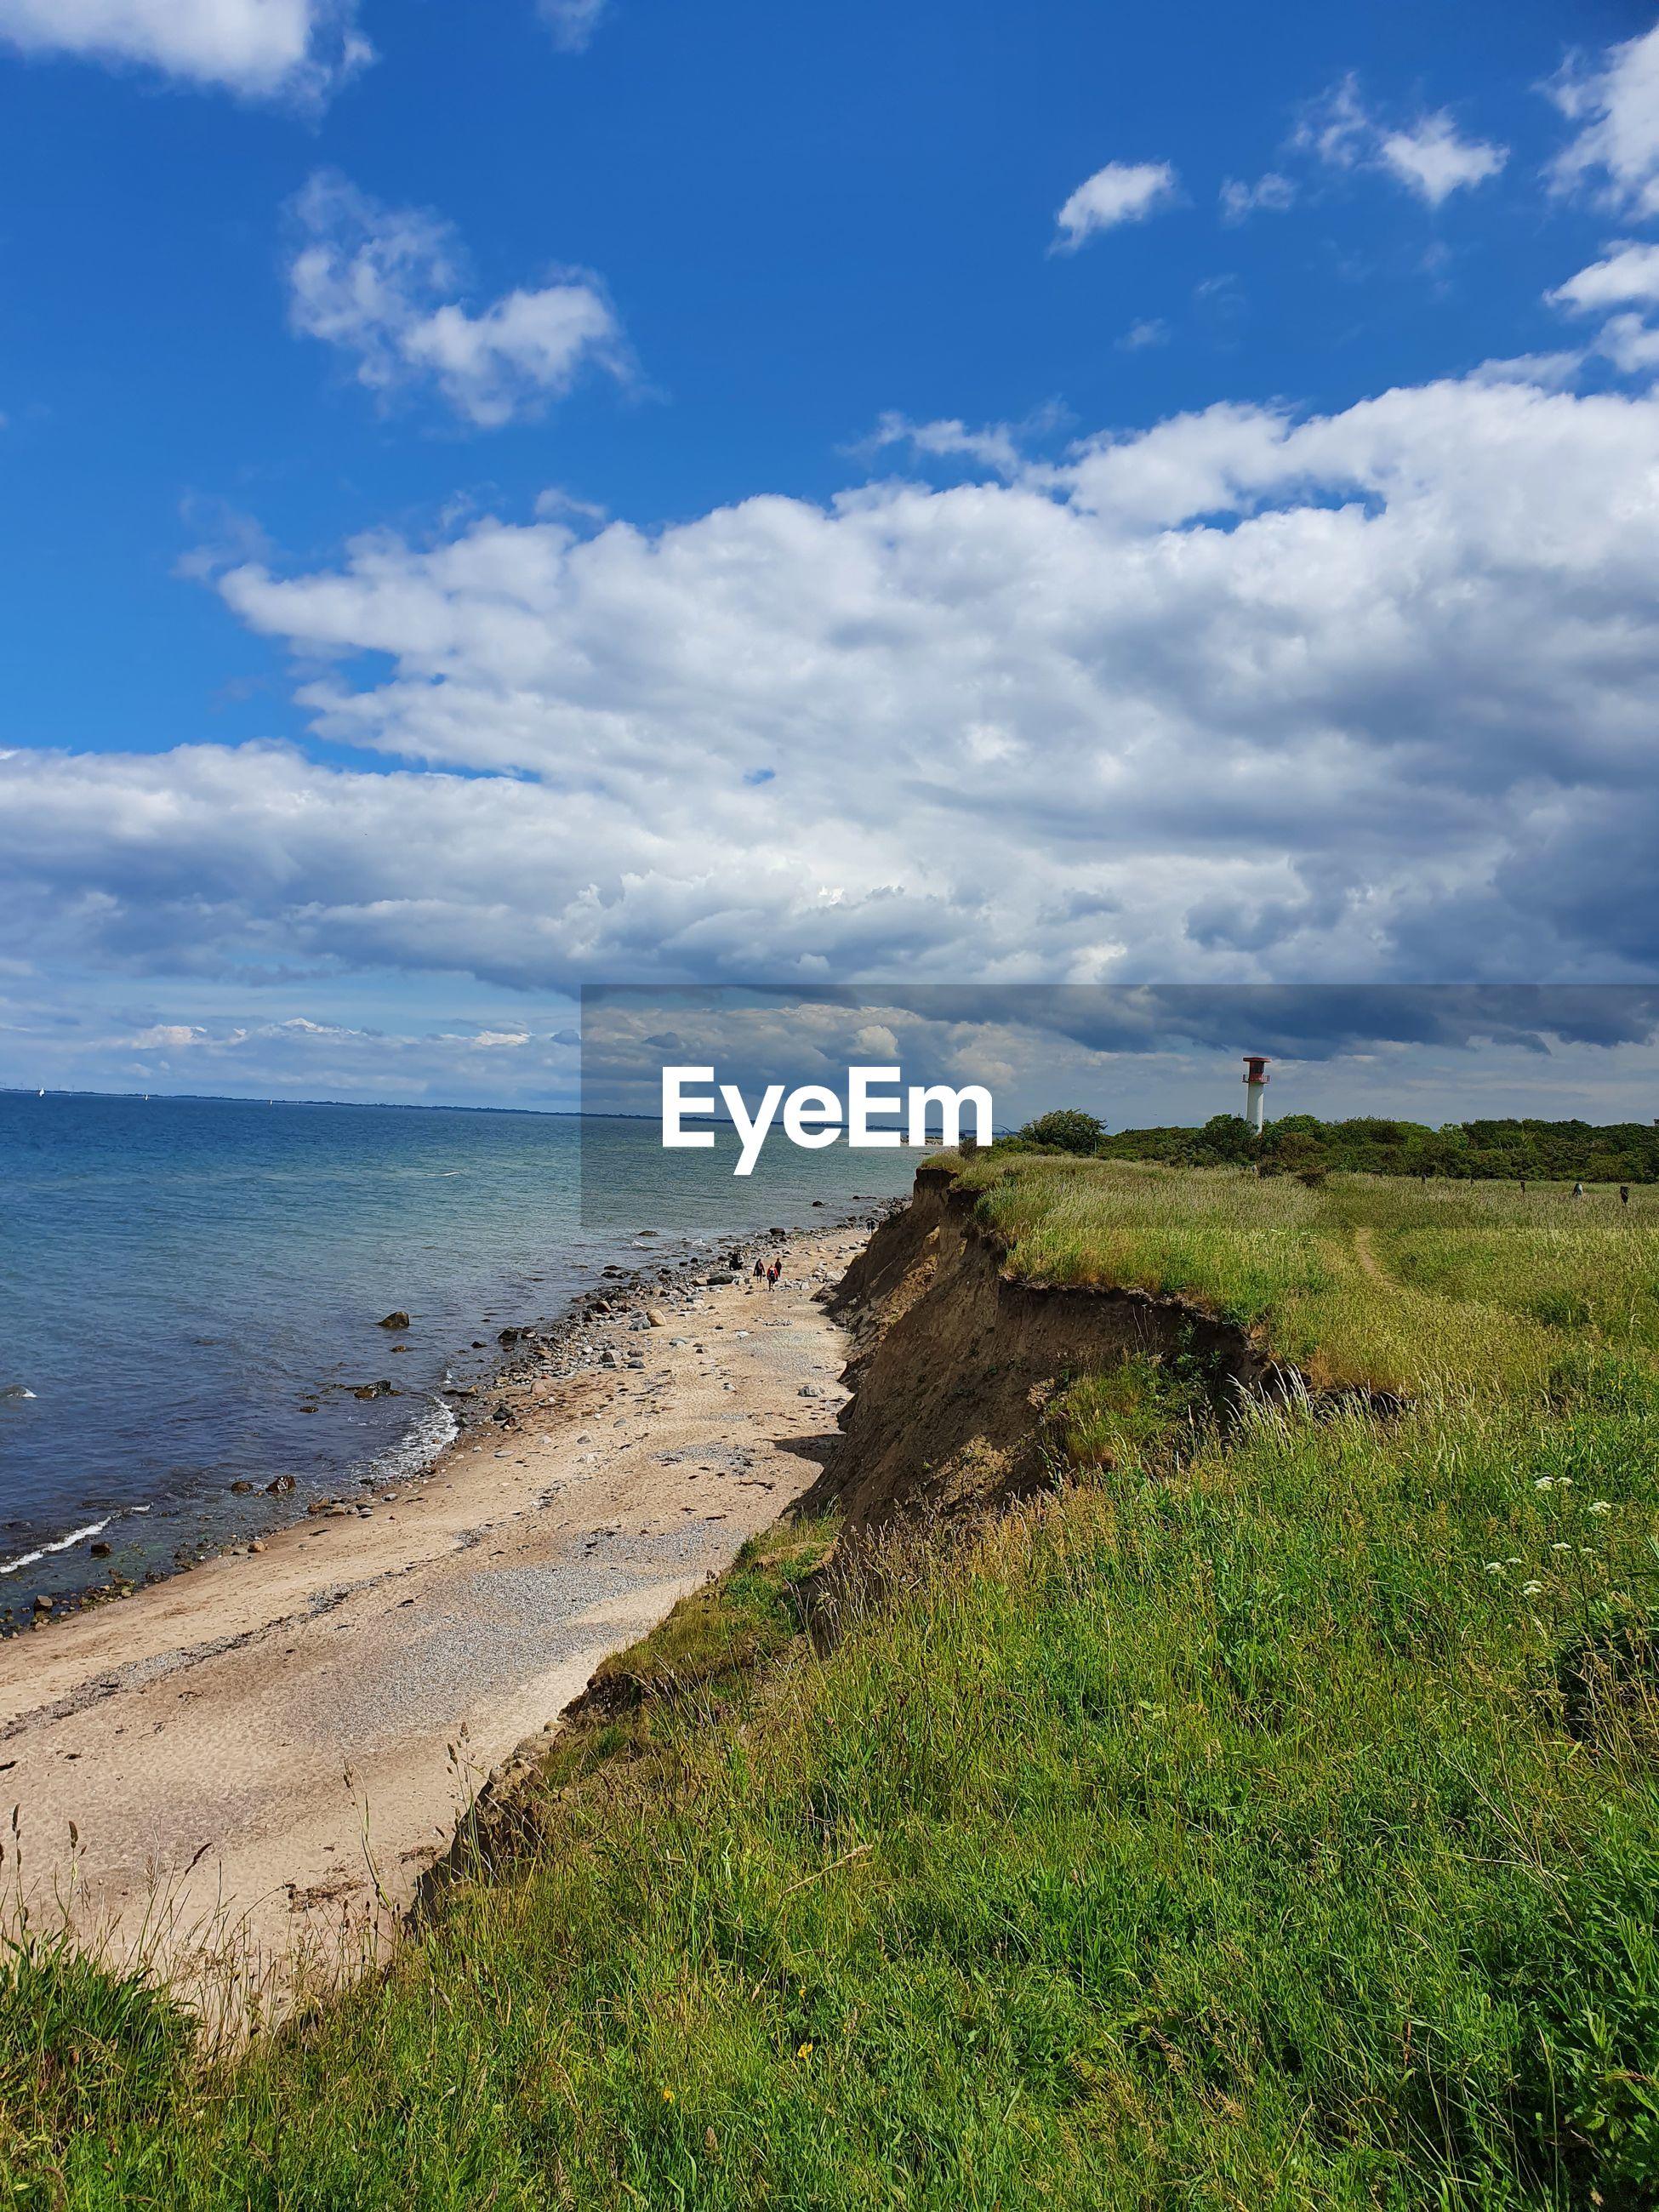 IDYLLIC VIEW OF BEACH AGAINST SKY